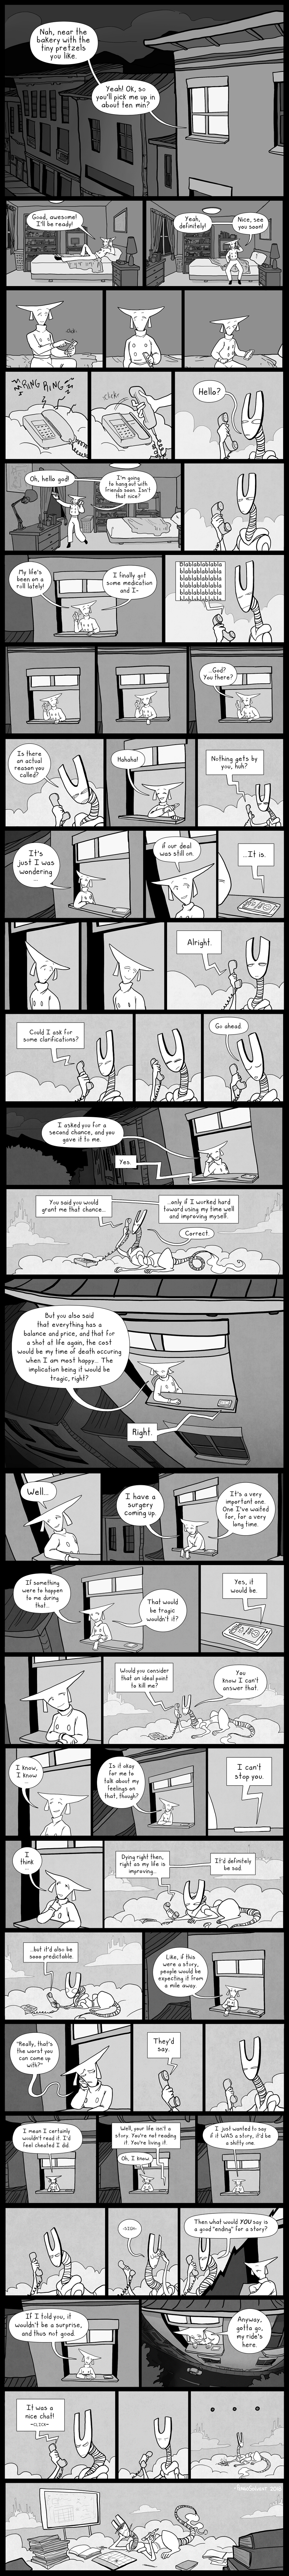 Phone Conversation Comic by pengosolvent